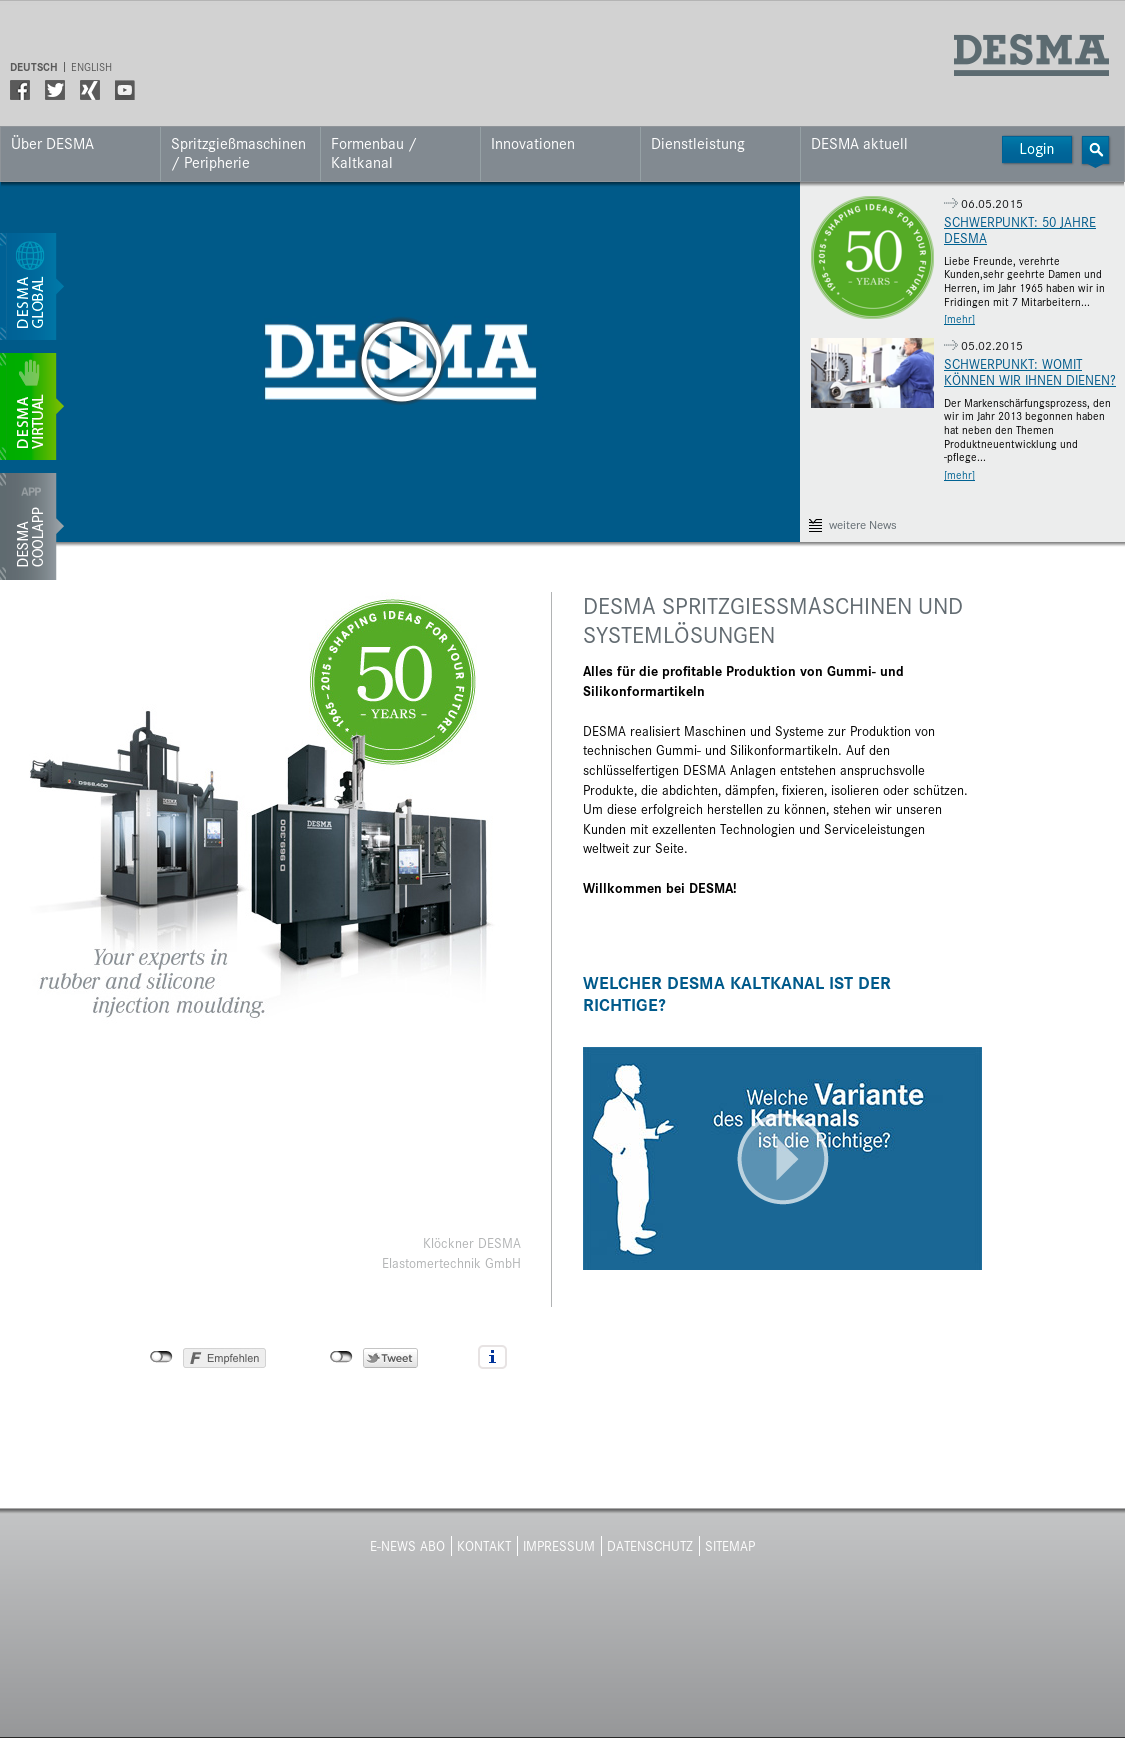 Desma Competitors, Revenue and Employees - Owler Company Profile